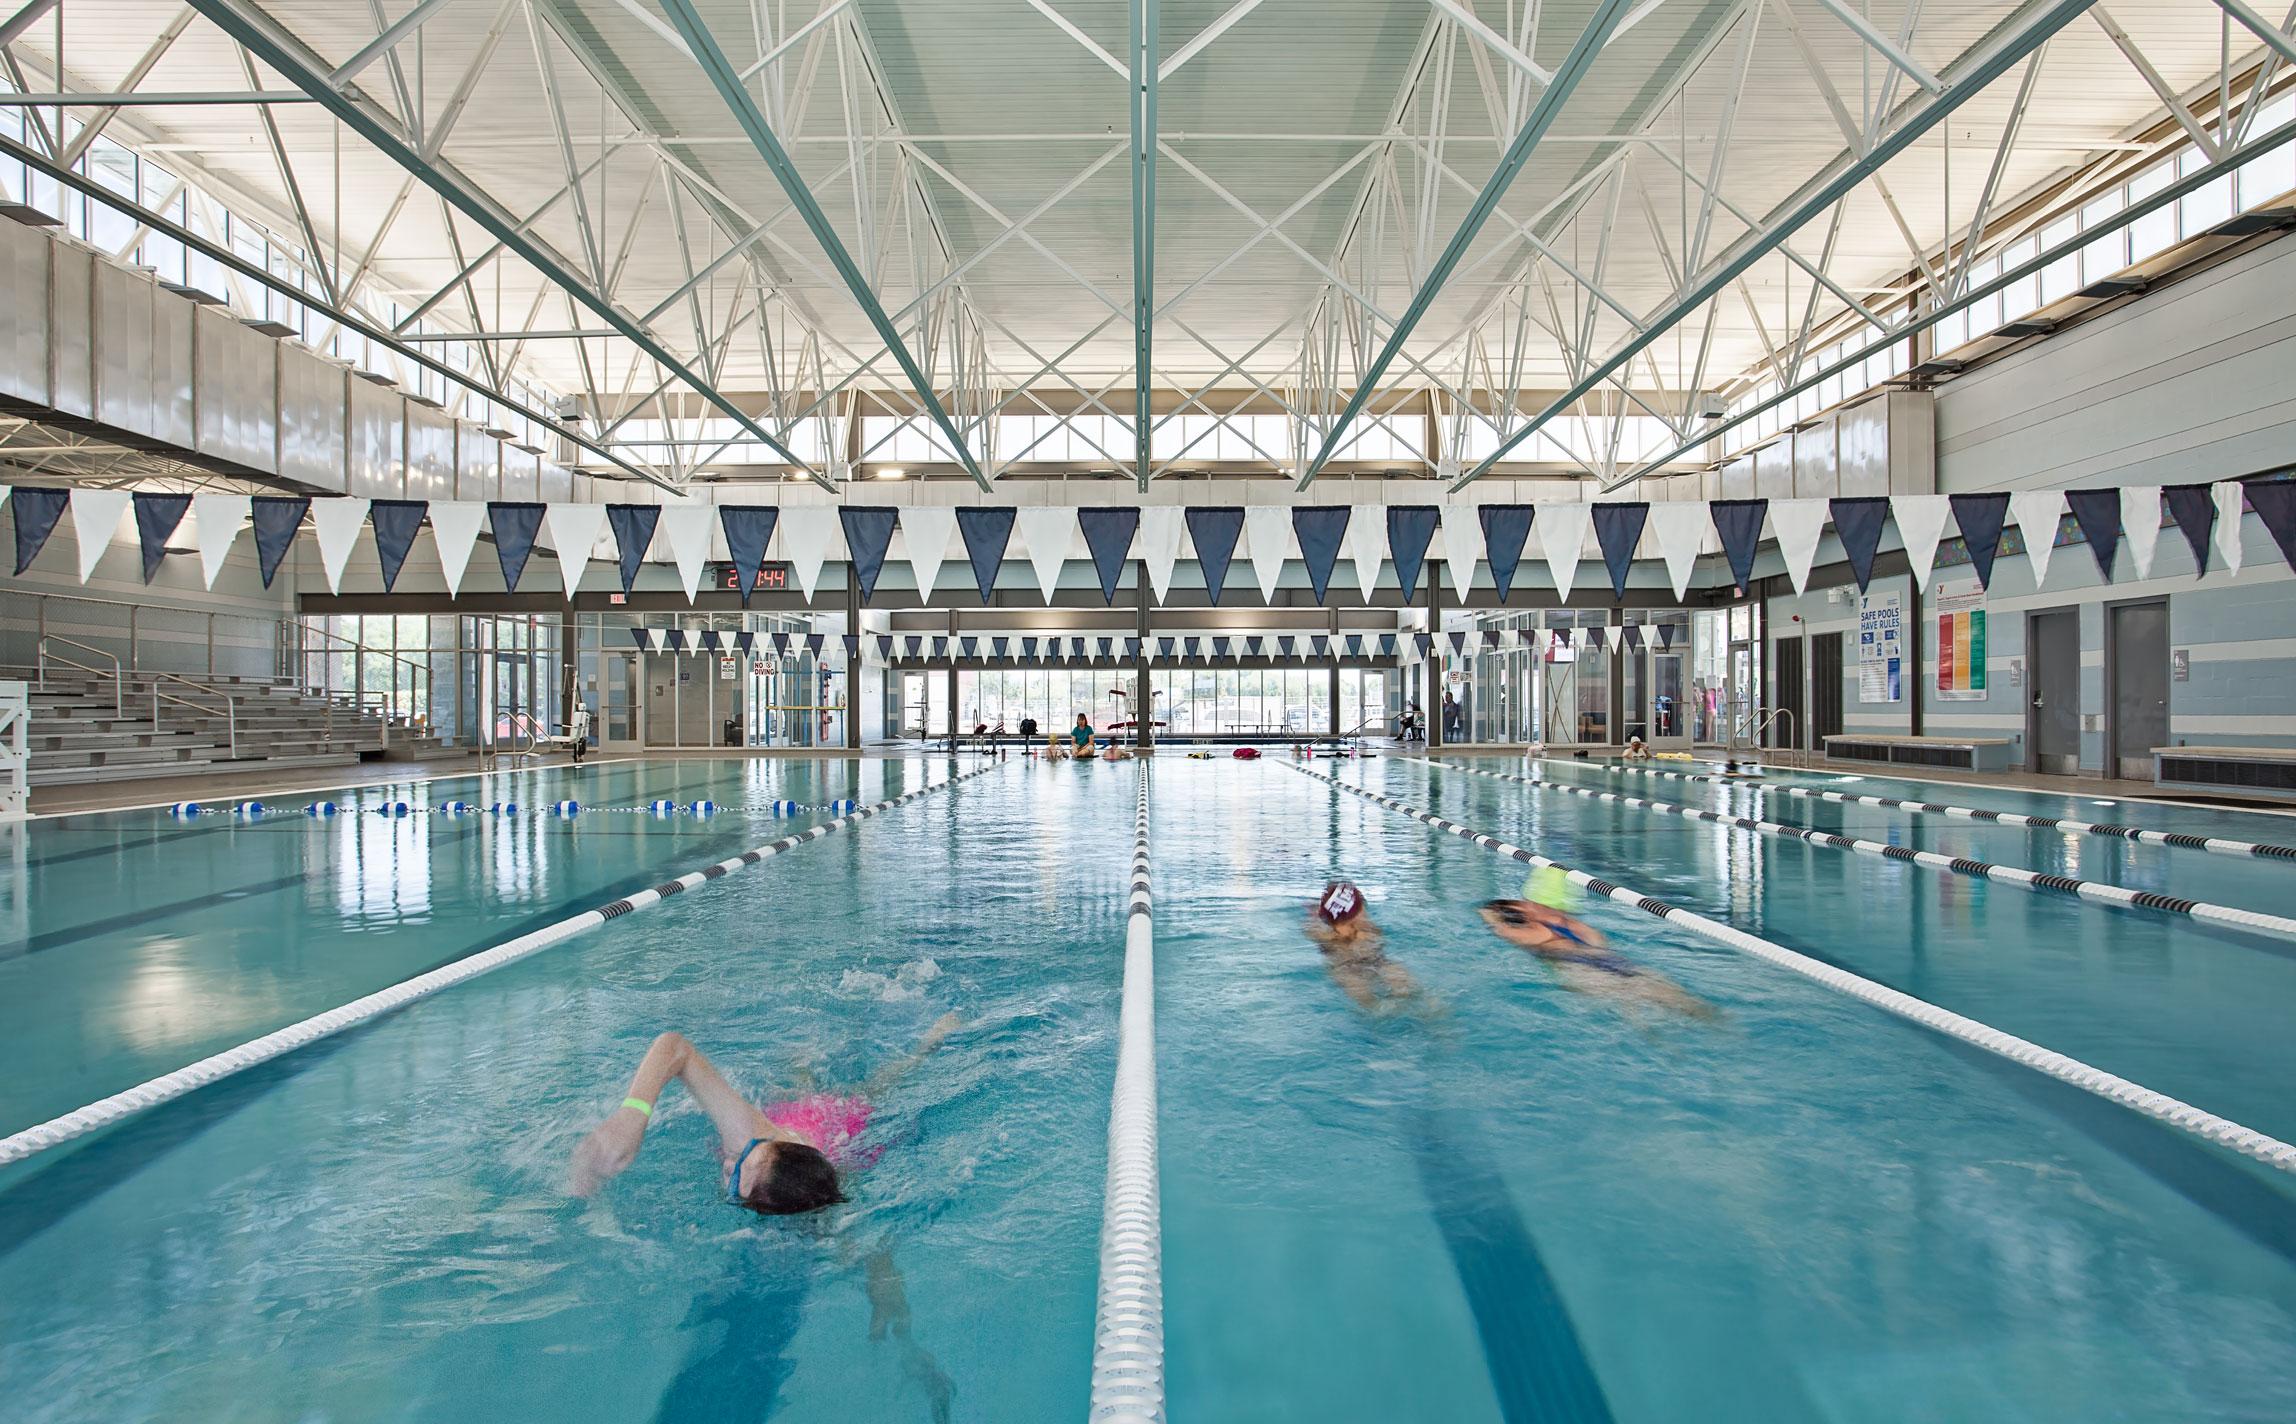 City of schertz natatorium marmon mok architecture City of san antonio swimming pools